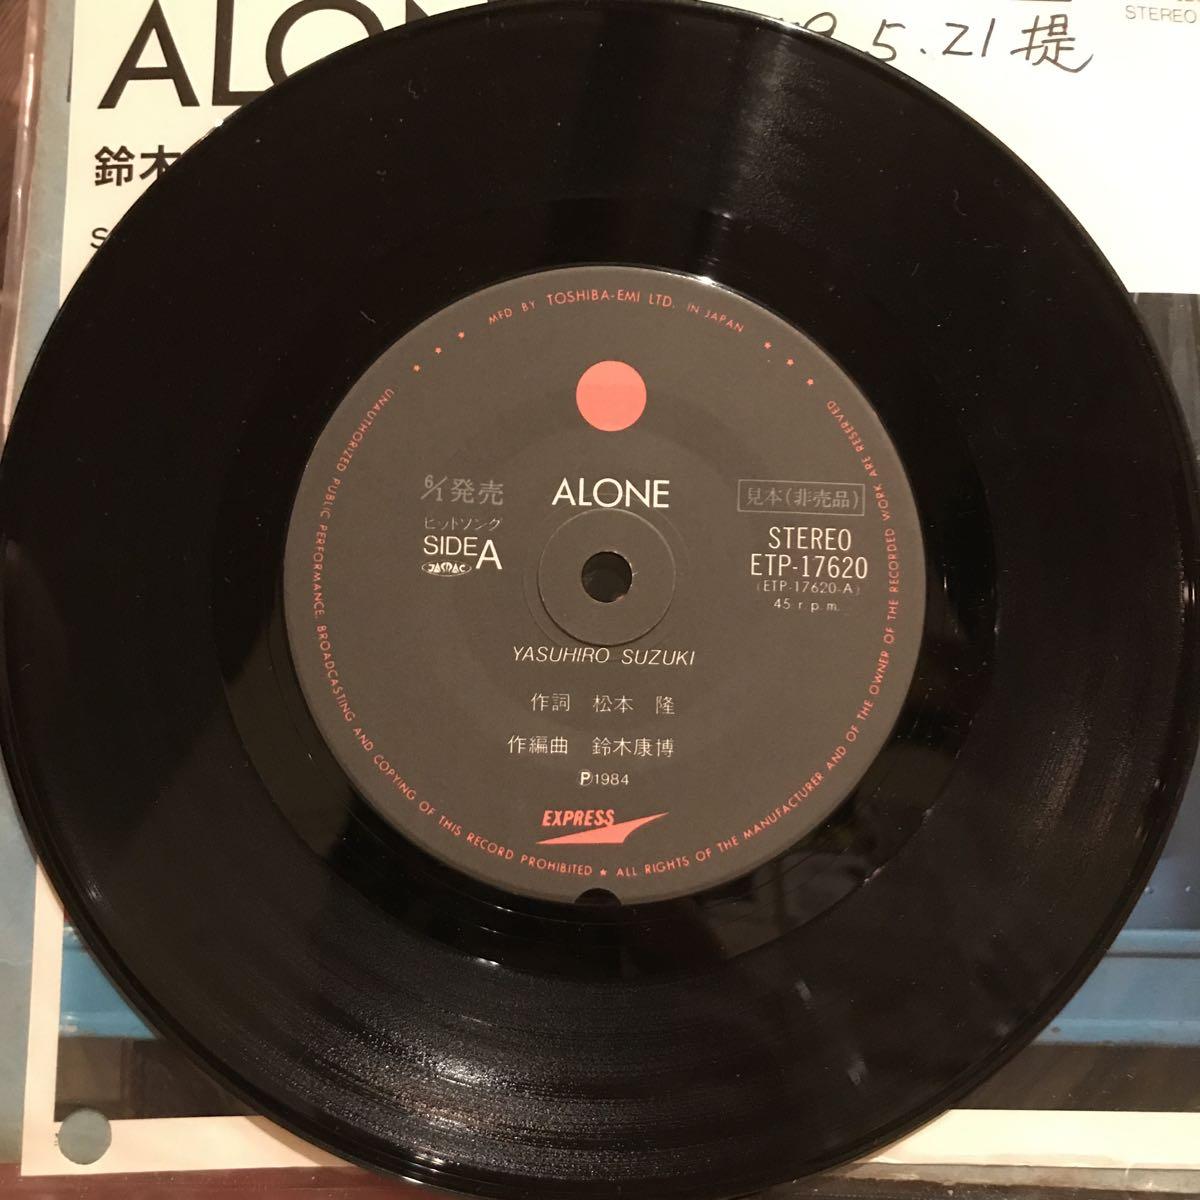 * EP【良品】非売品 見本盤 希少 和モノ 45s【 鈴木康博 】ALONE / 夏が過ぎても 松本隆 オフコース 1984年 歌詞カード付き_画像3